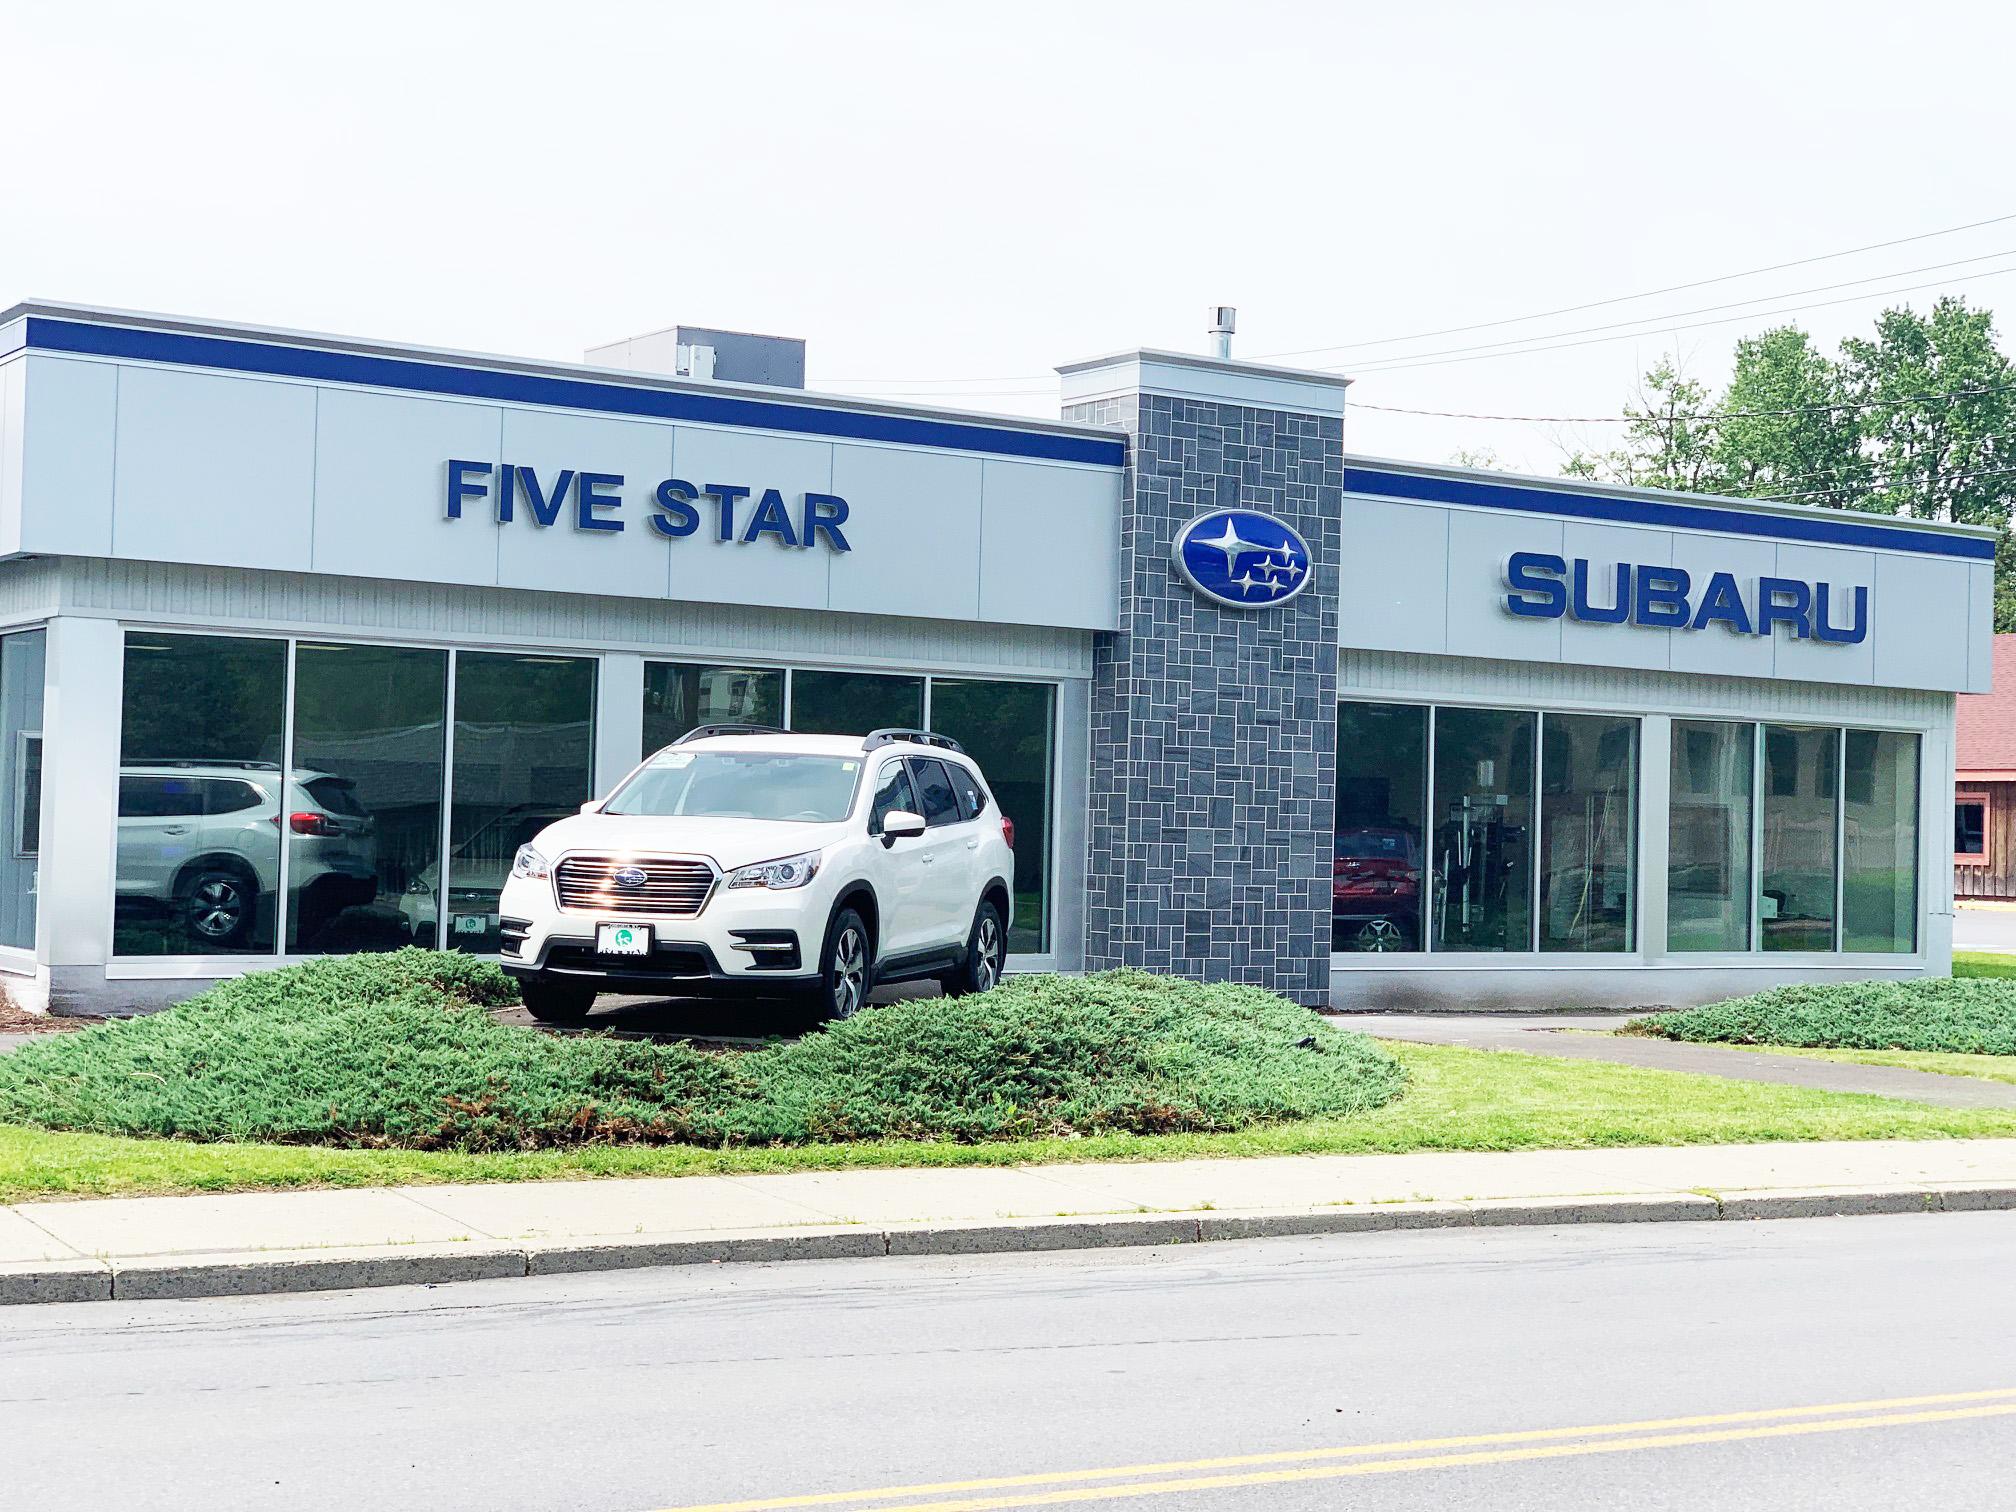 Five Star Subaru